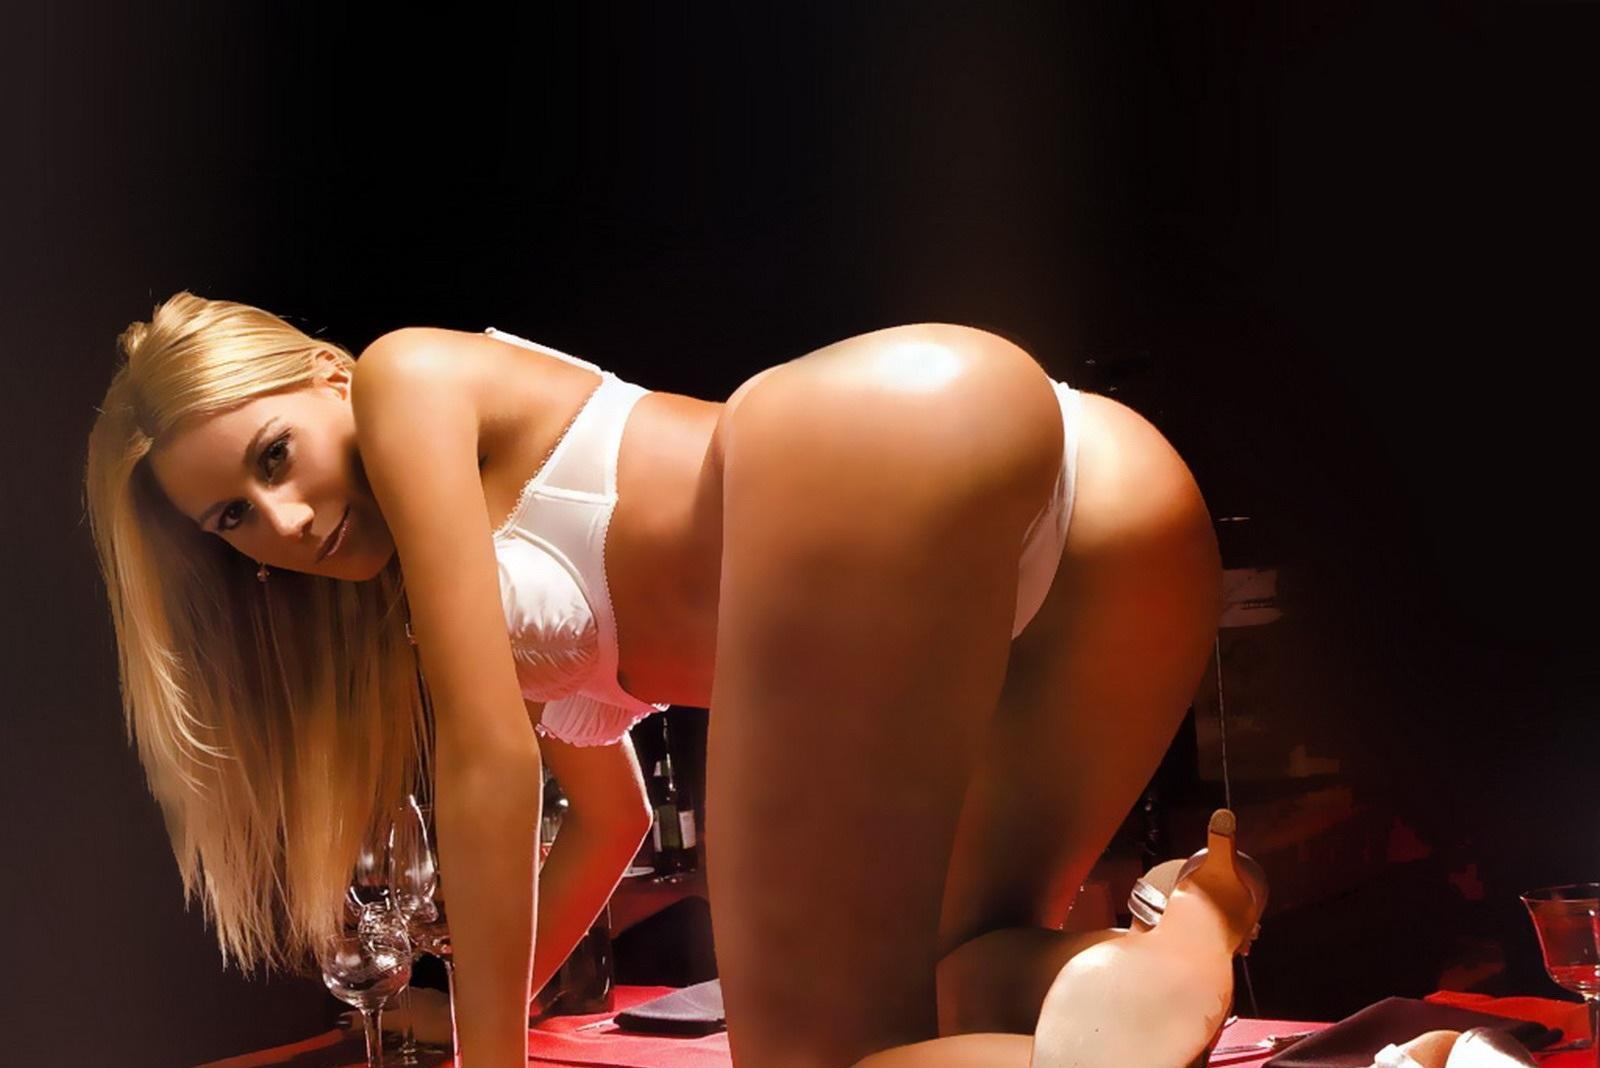 Видеоклип ютуб девушка еротика